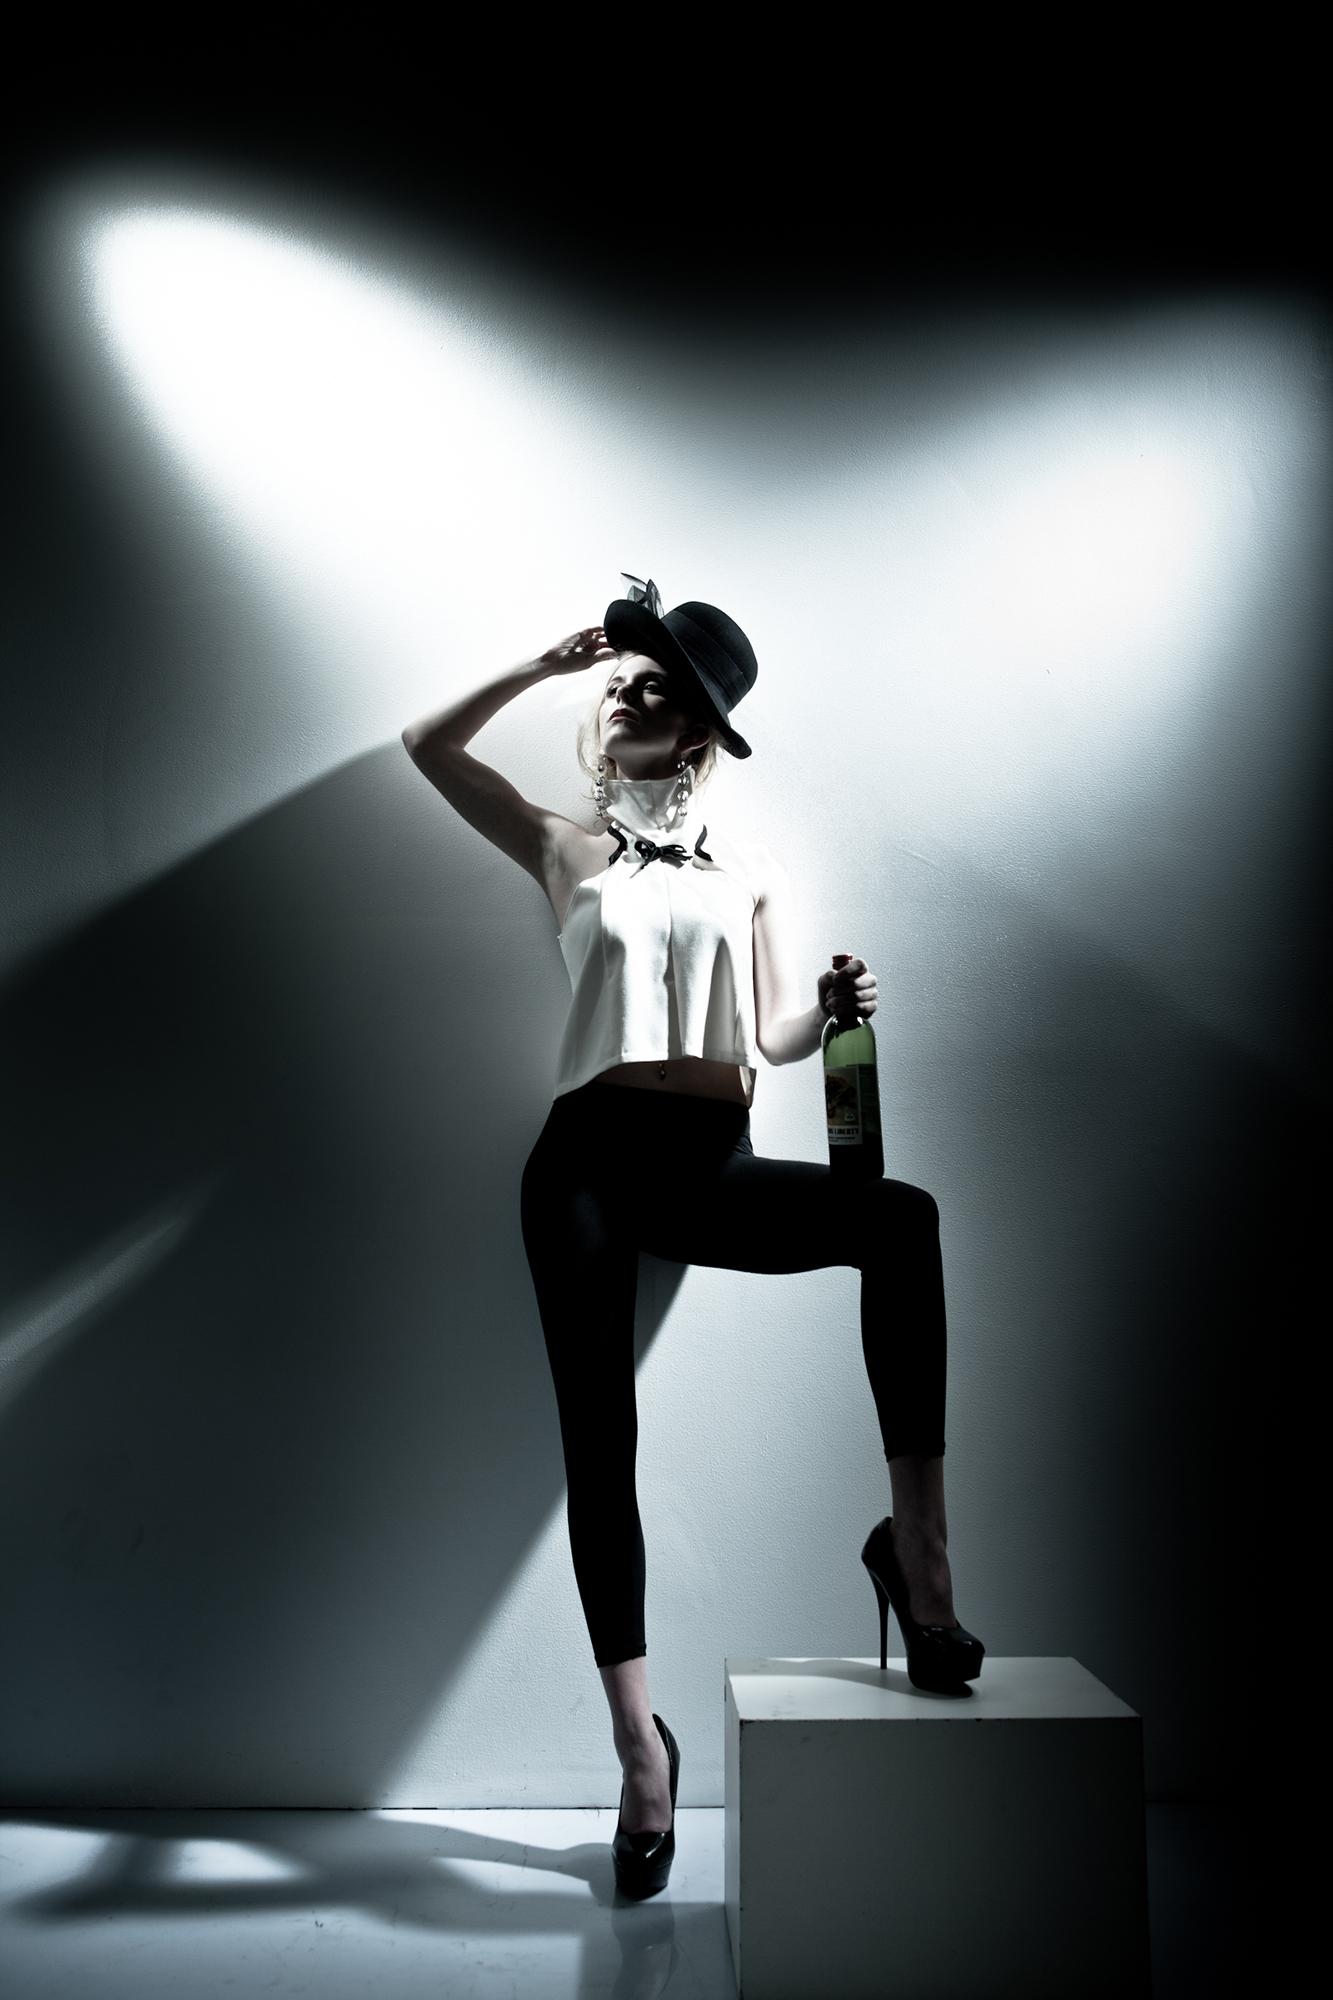 Dominic Chow - Drea Elizabeth @ Model Club Inc - hair Kristen Walsh - makeup Estela Hernandez - wardrobe Amanda Lalite - accessories Sasha Mystique